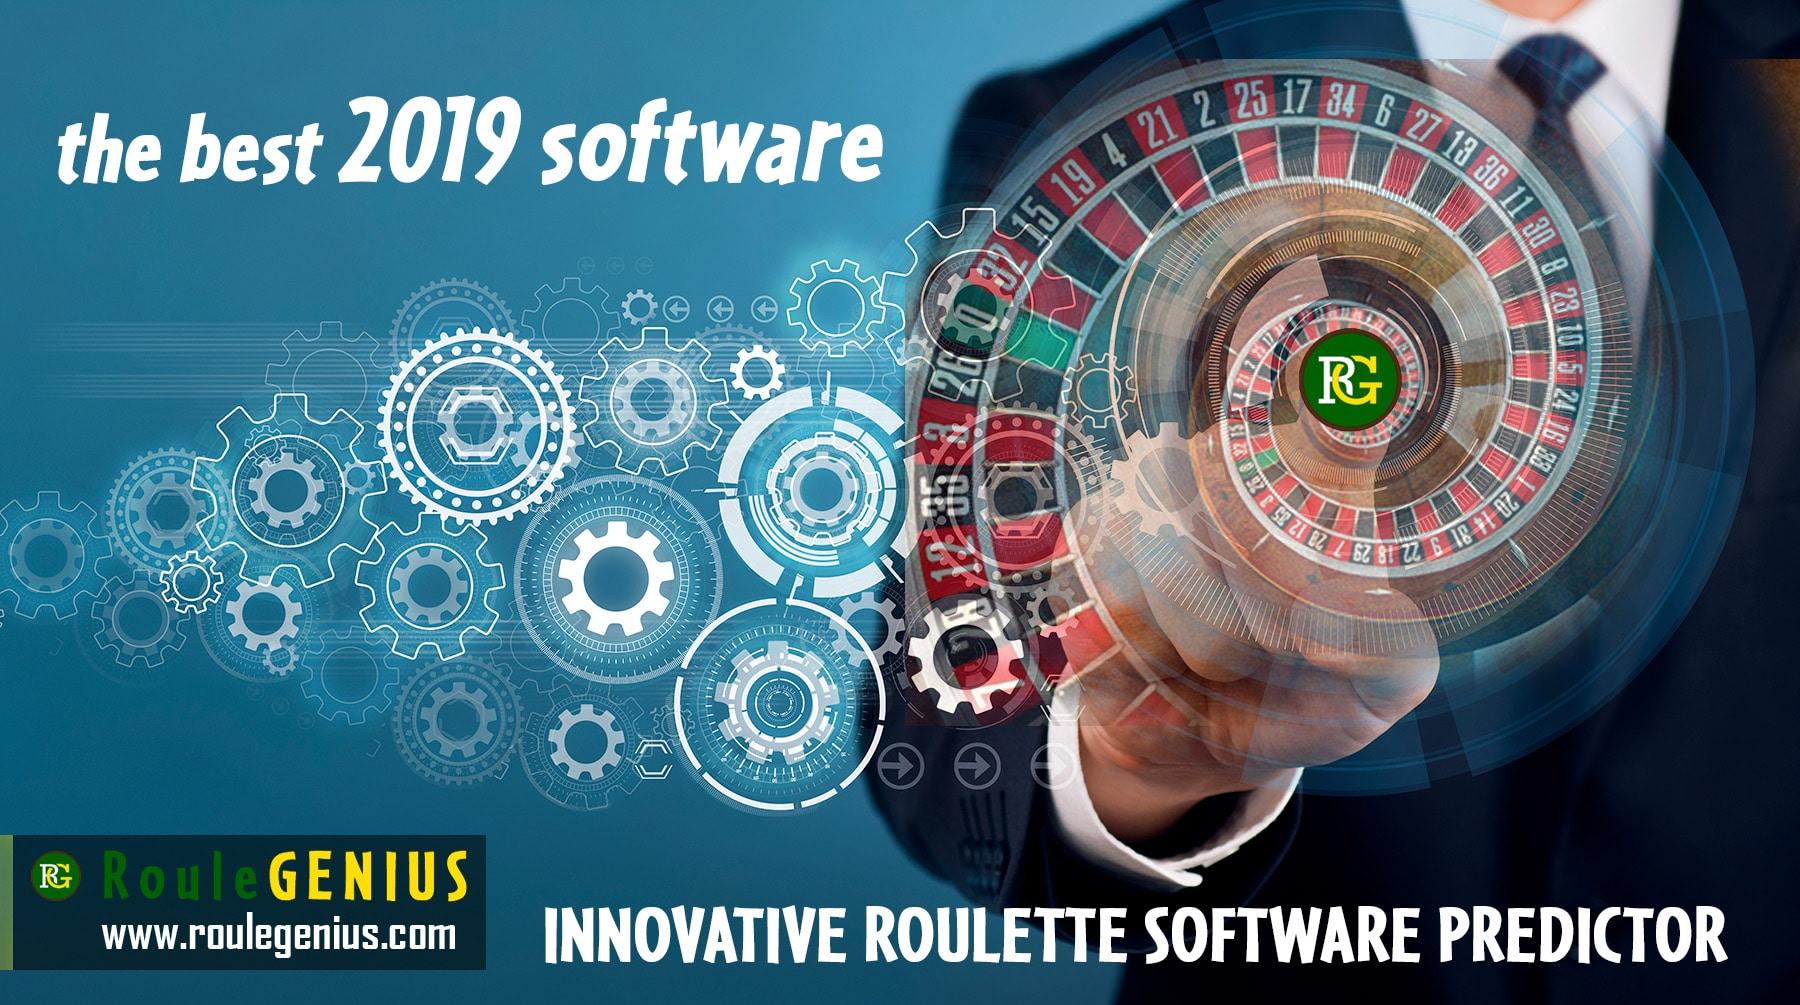 innovative predictor roulegenius 1024x572 - Search the innovation